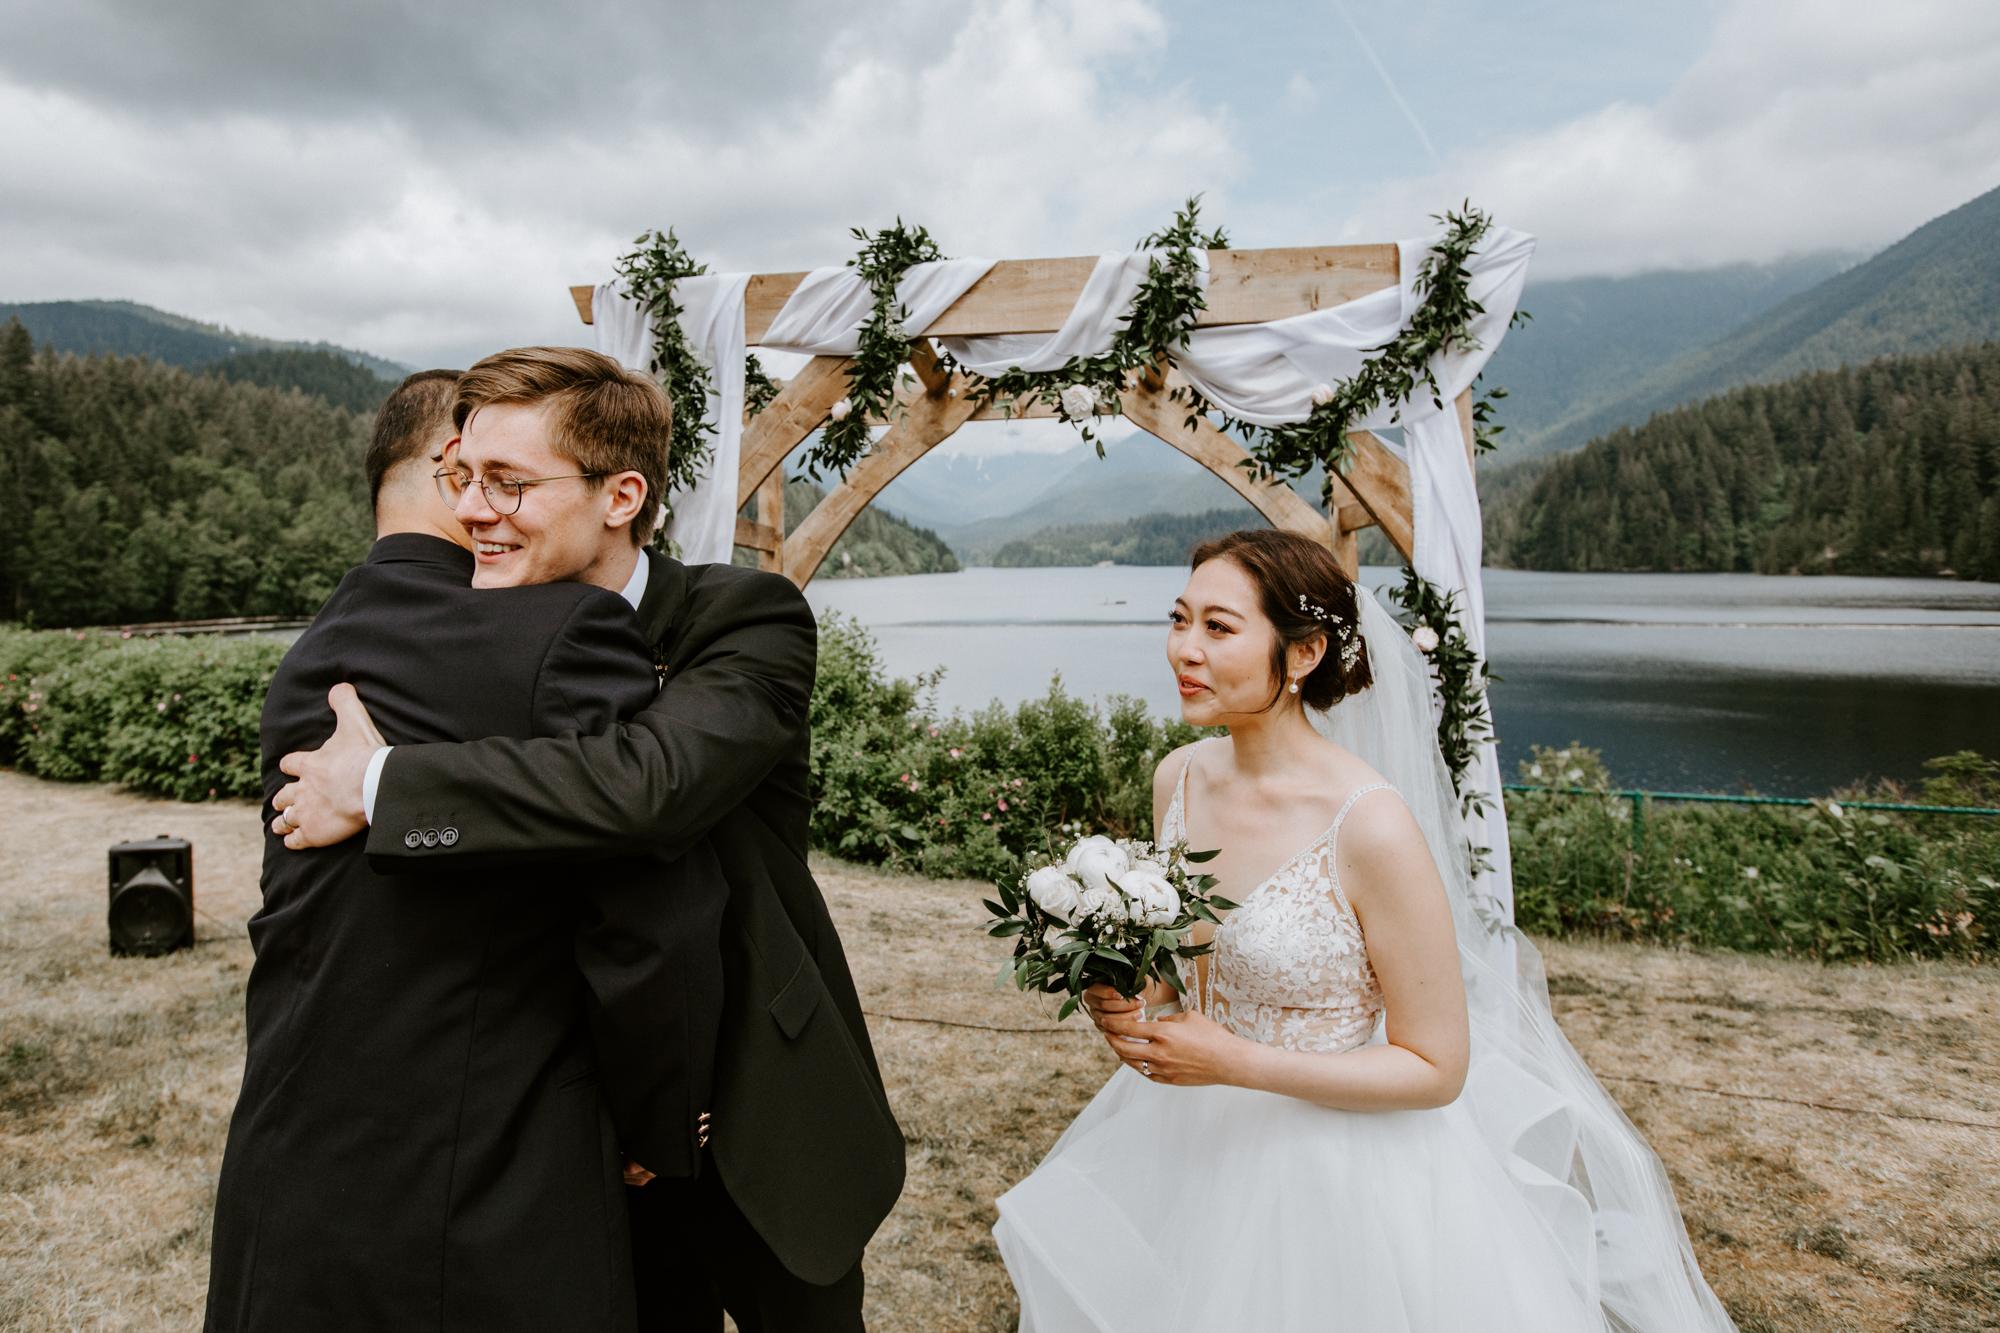 Yelim& Sorin- Wedding Day- HL-SD-239.JPG